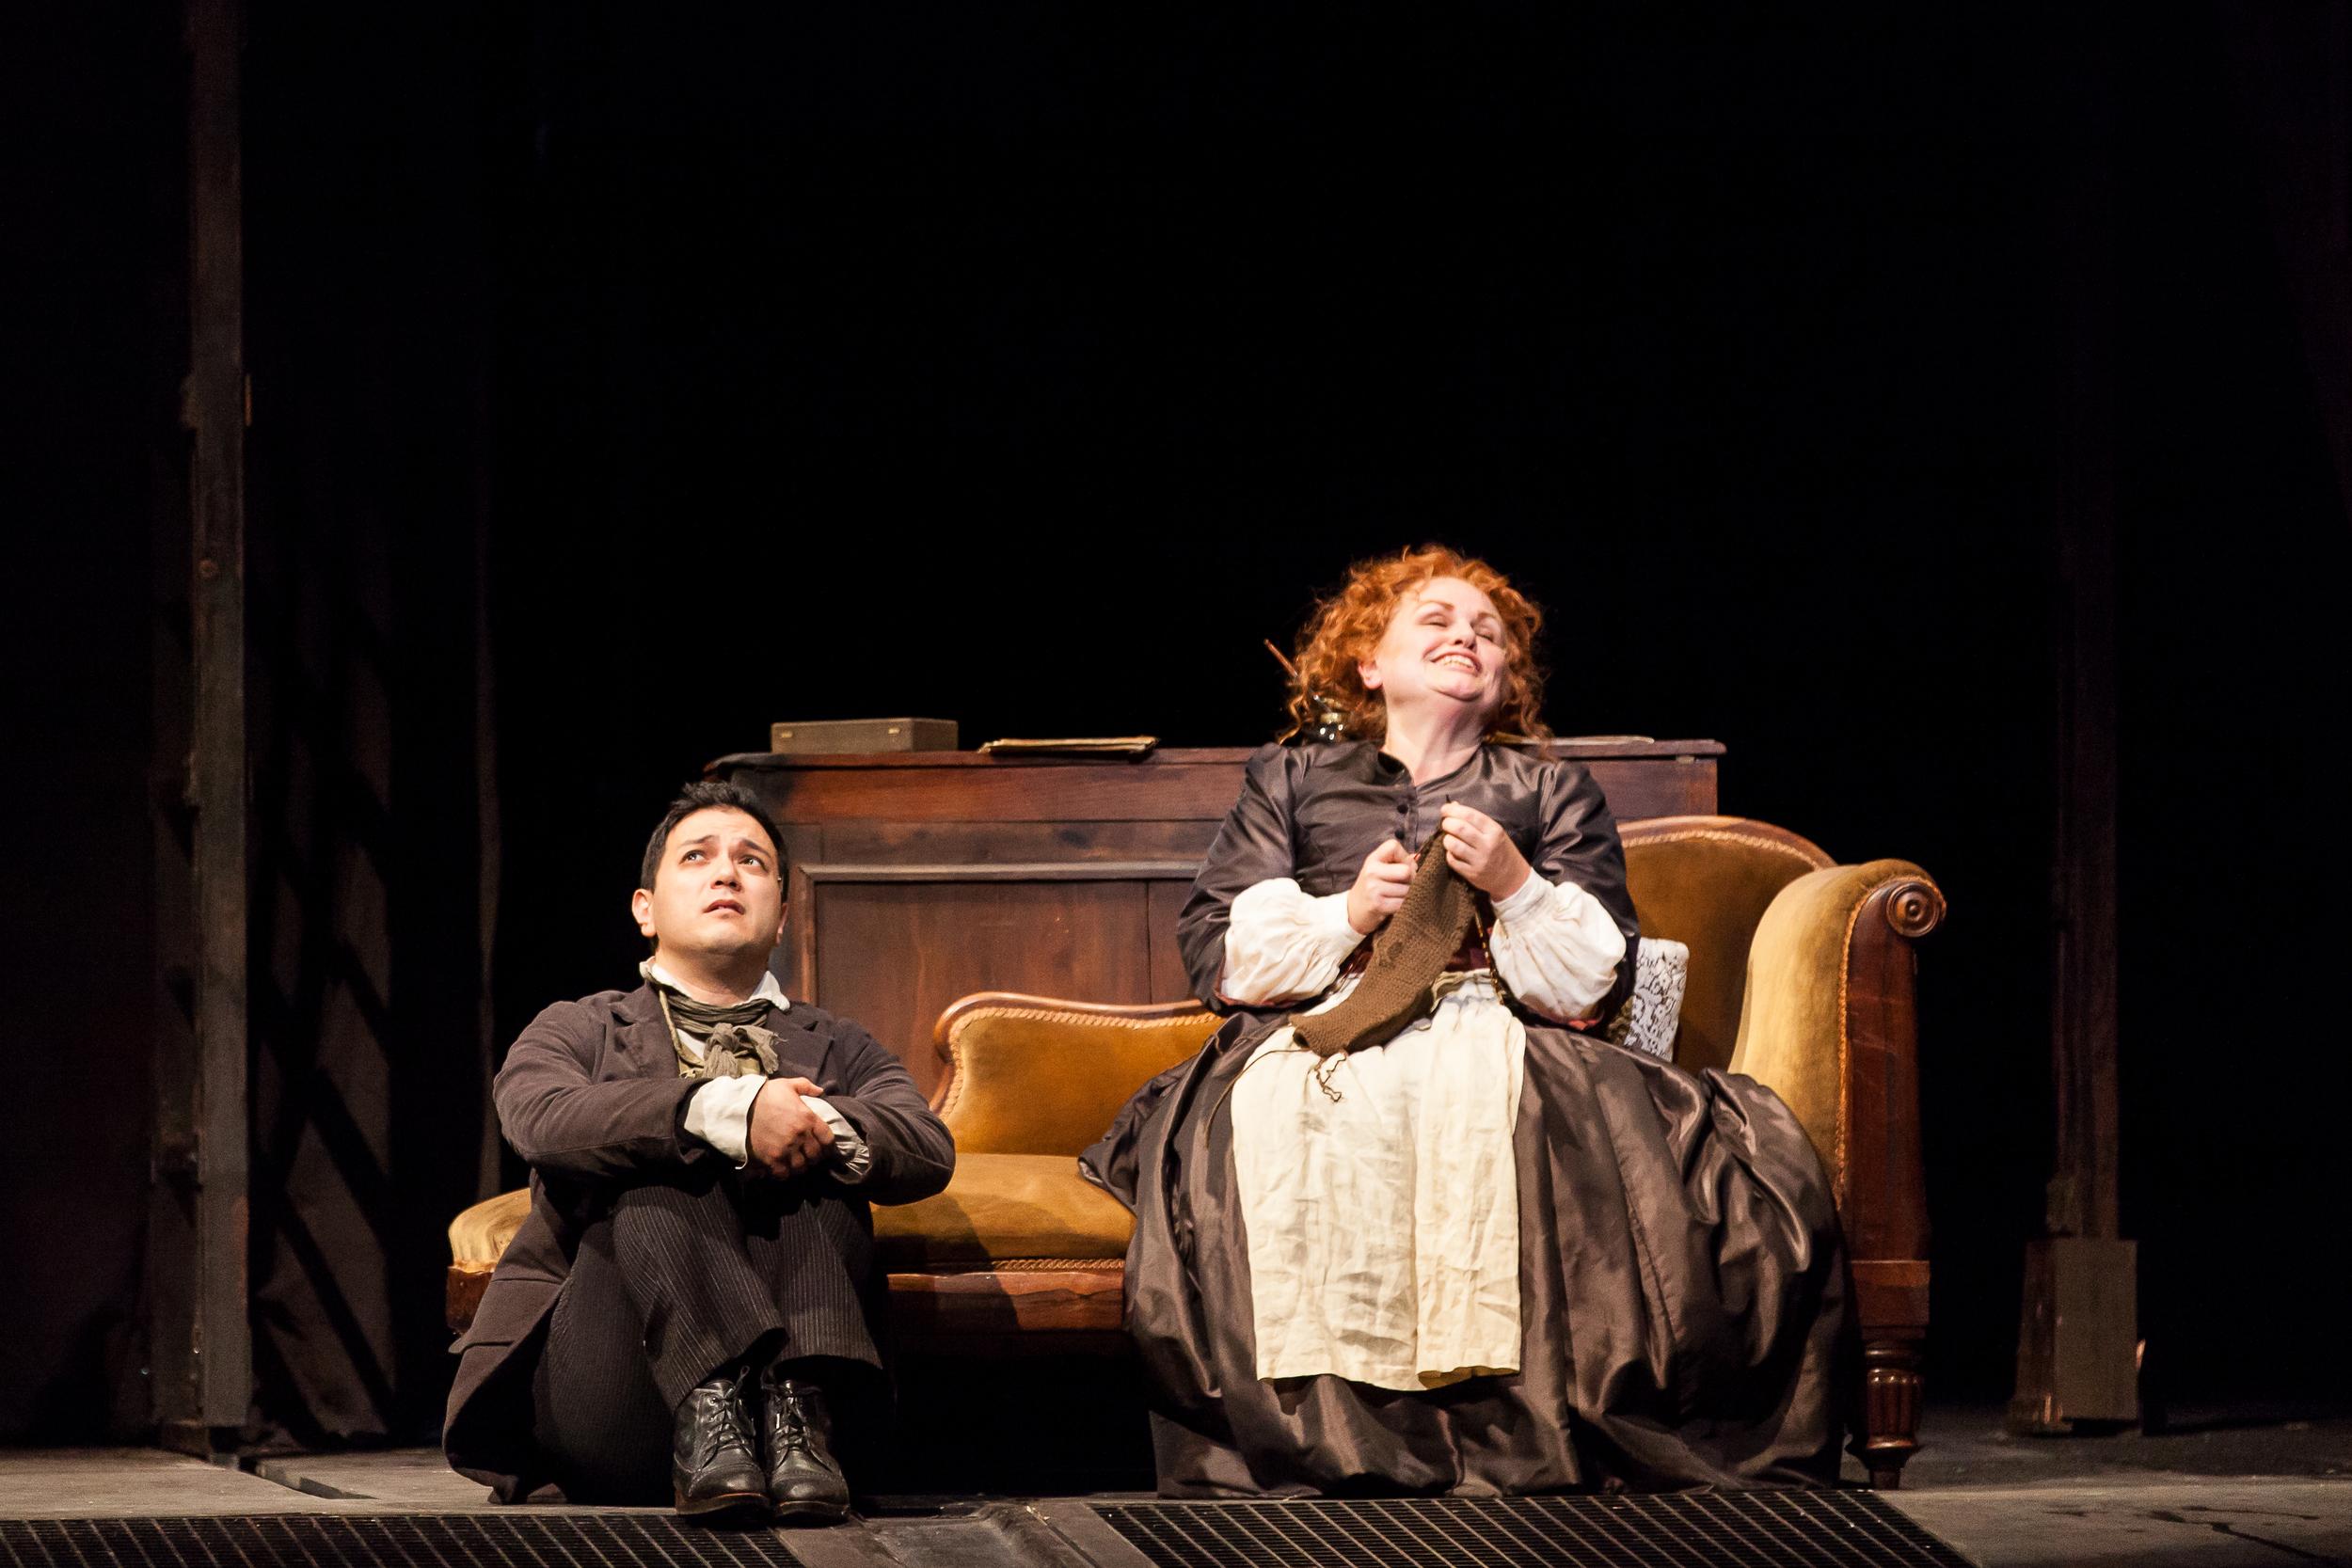 Tobias Ragg in  Sweeney Todd (Sondheim) at Houston Grand Opera with Susan Bullock, soprano (Photo credit: Lynn Lane)